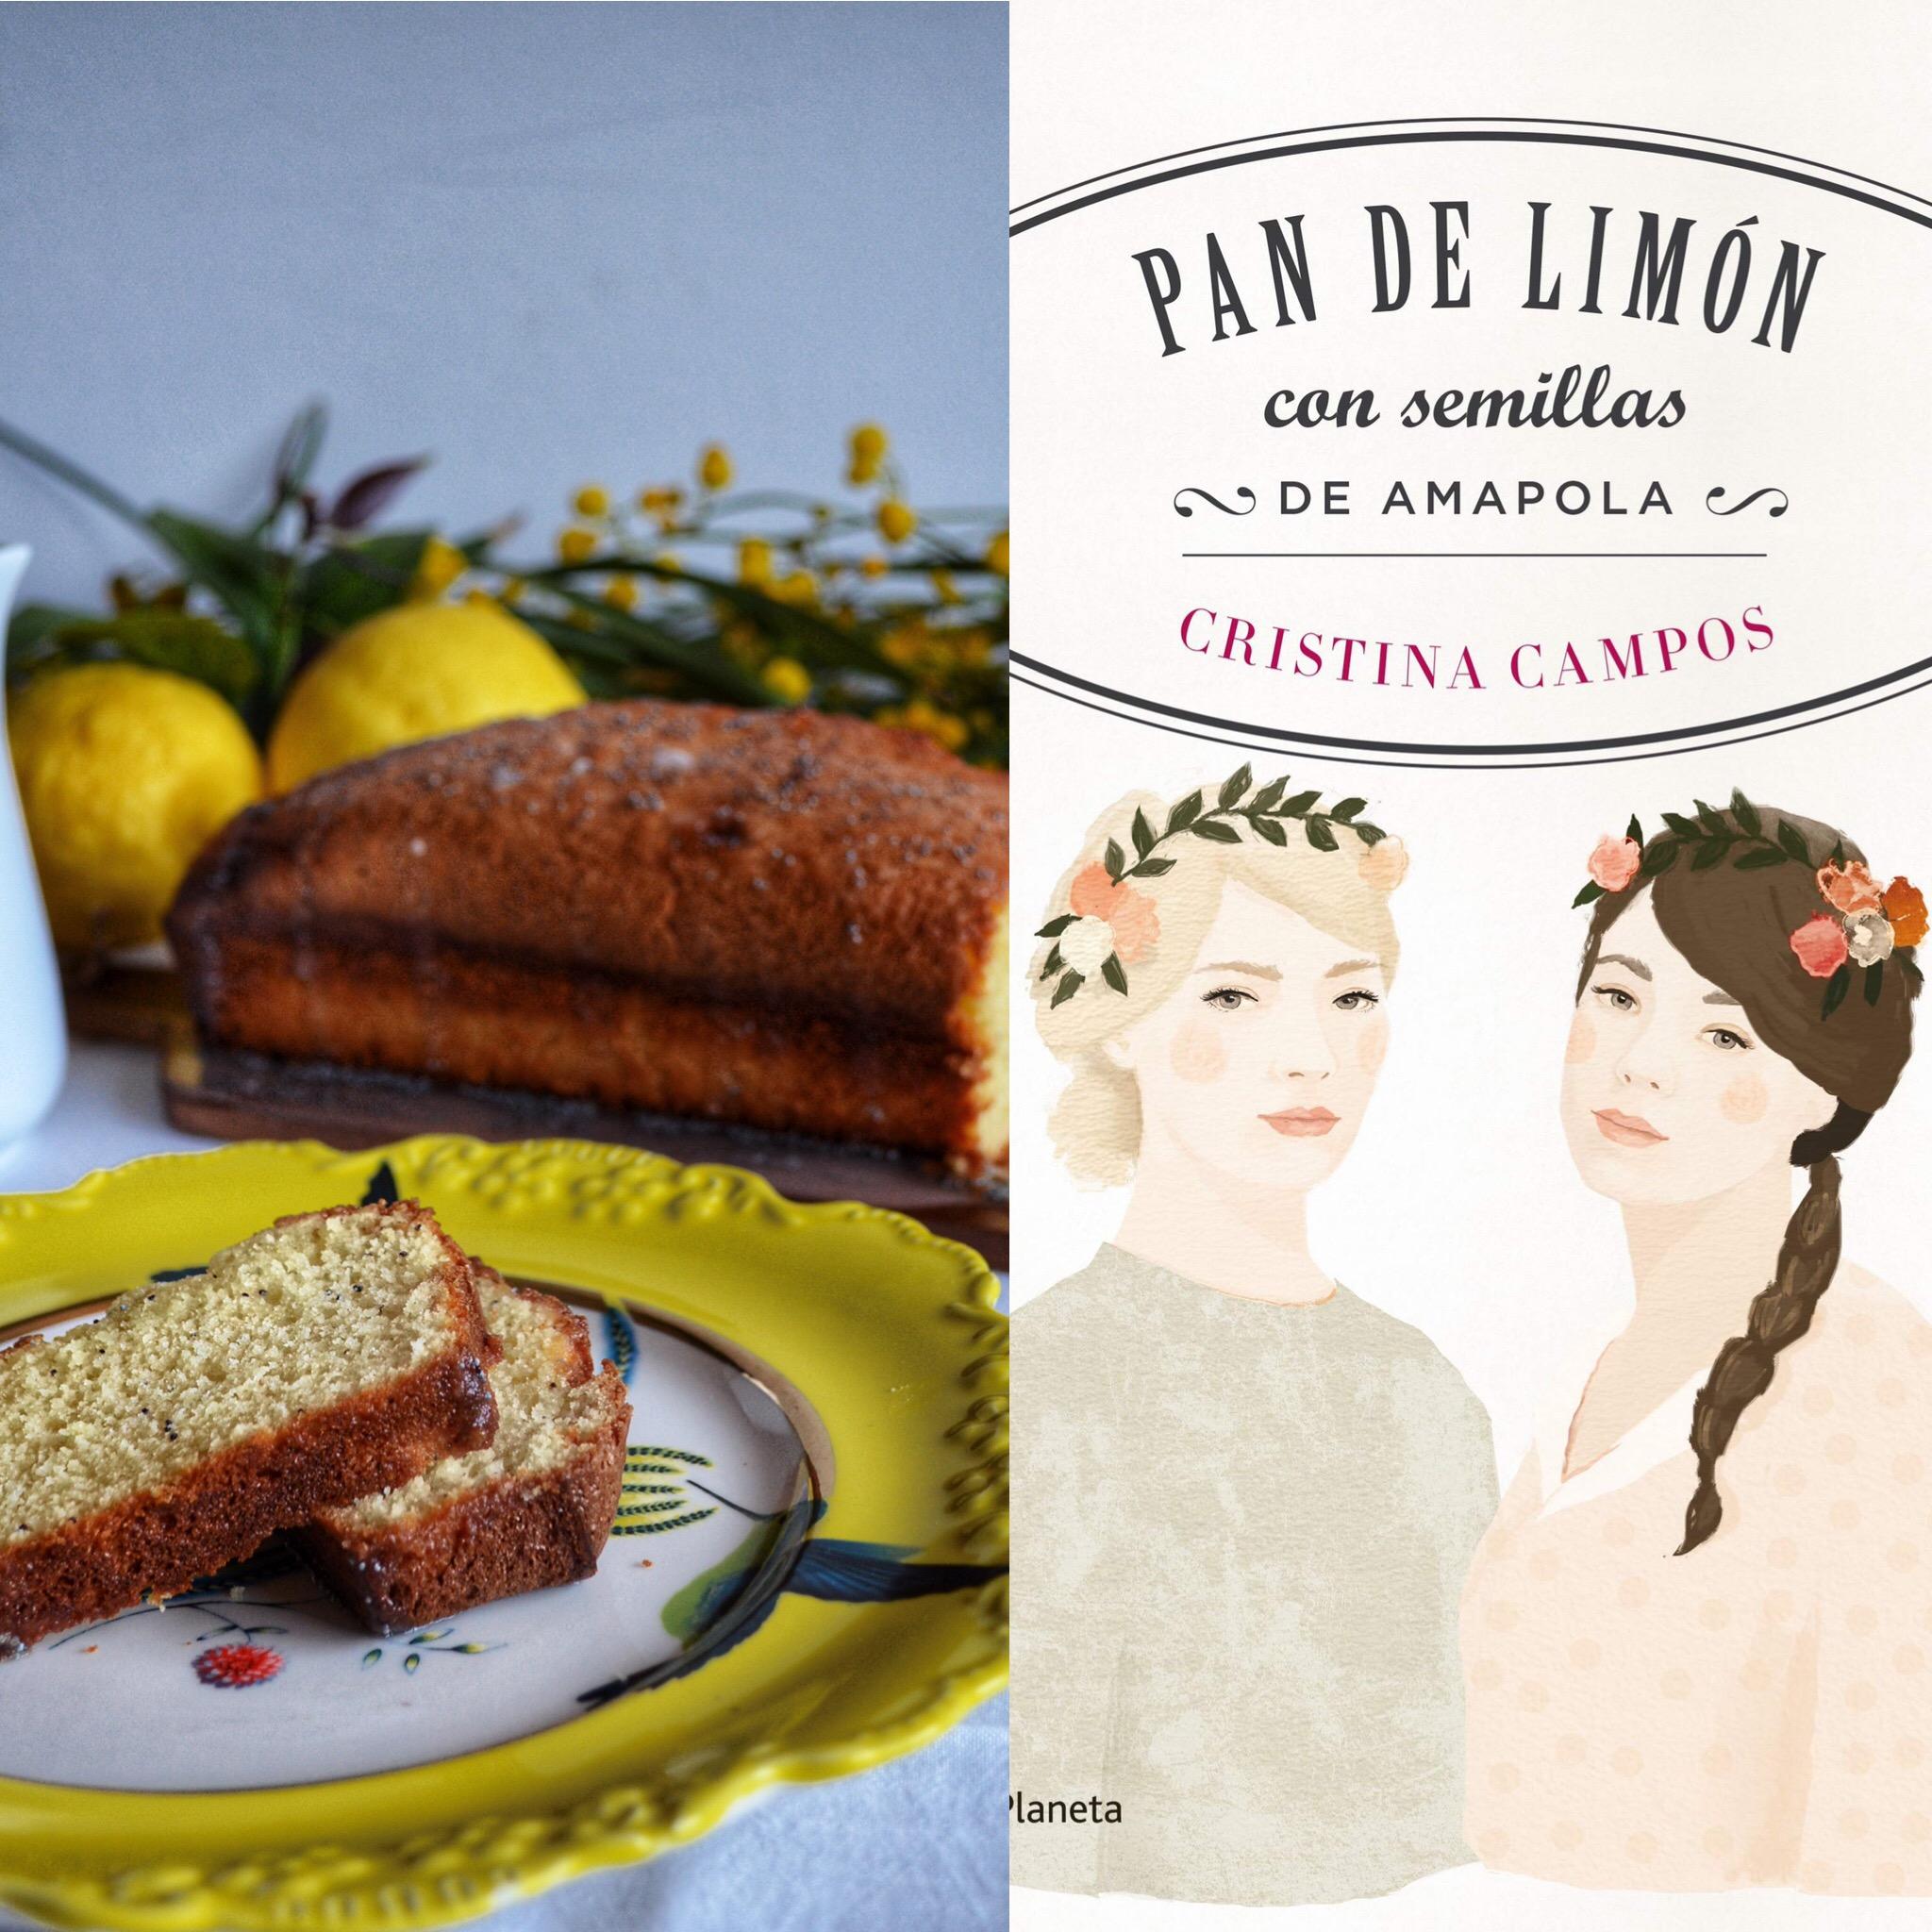 Pan de limón con semillas de Amapola (Sant Jordi)